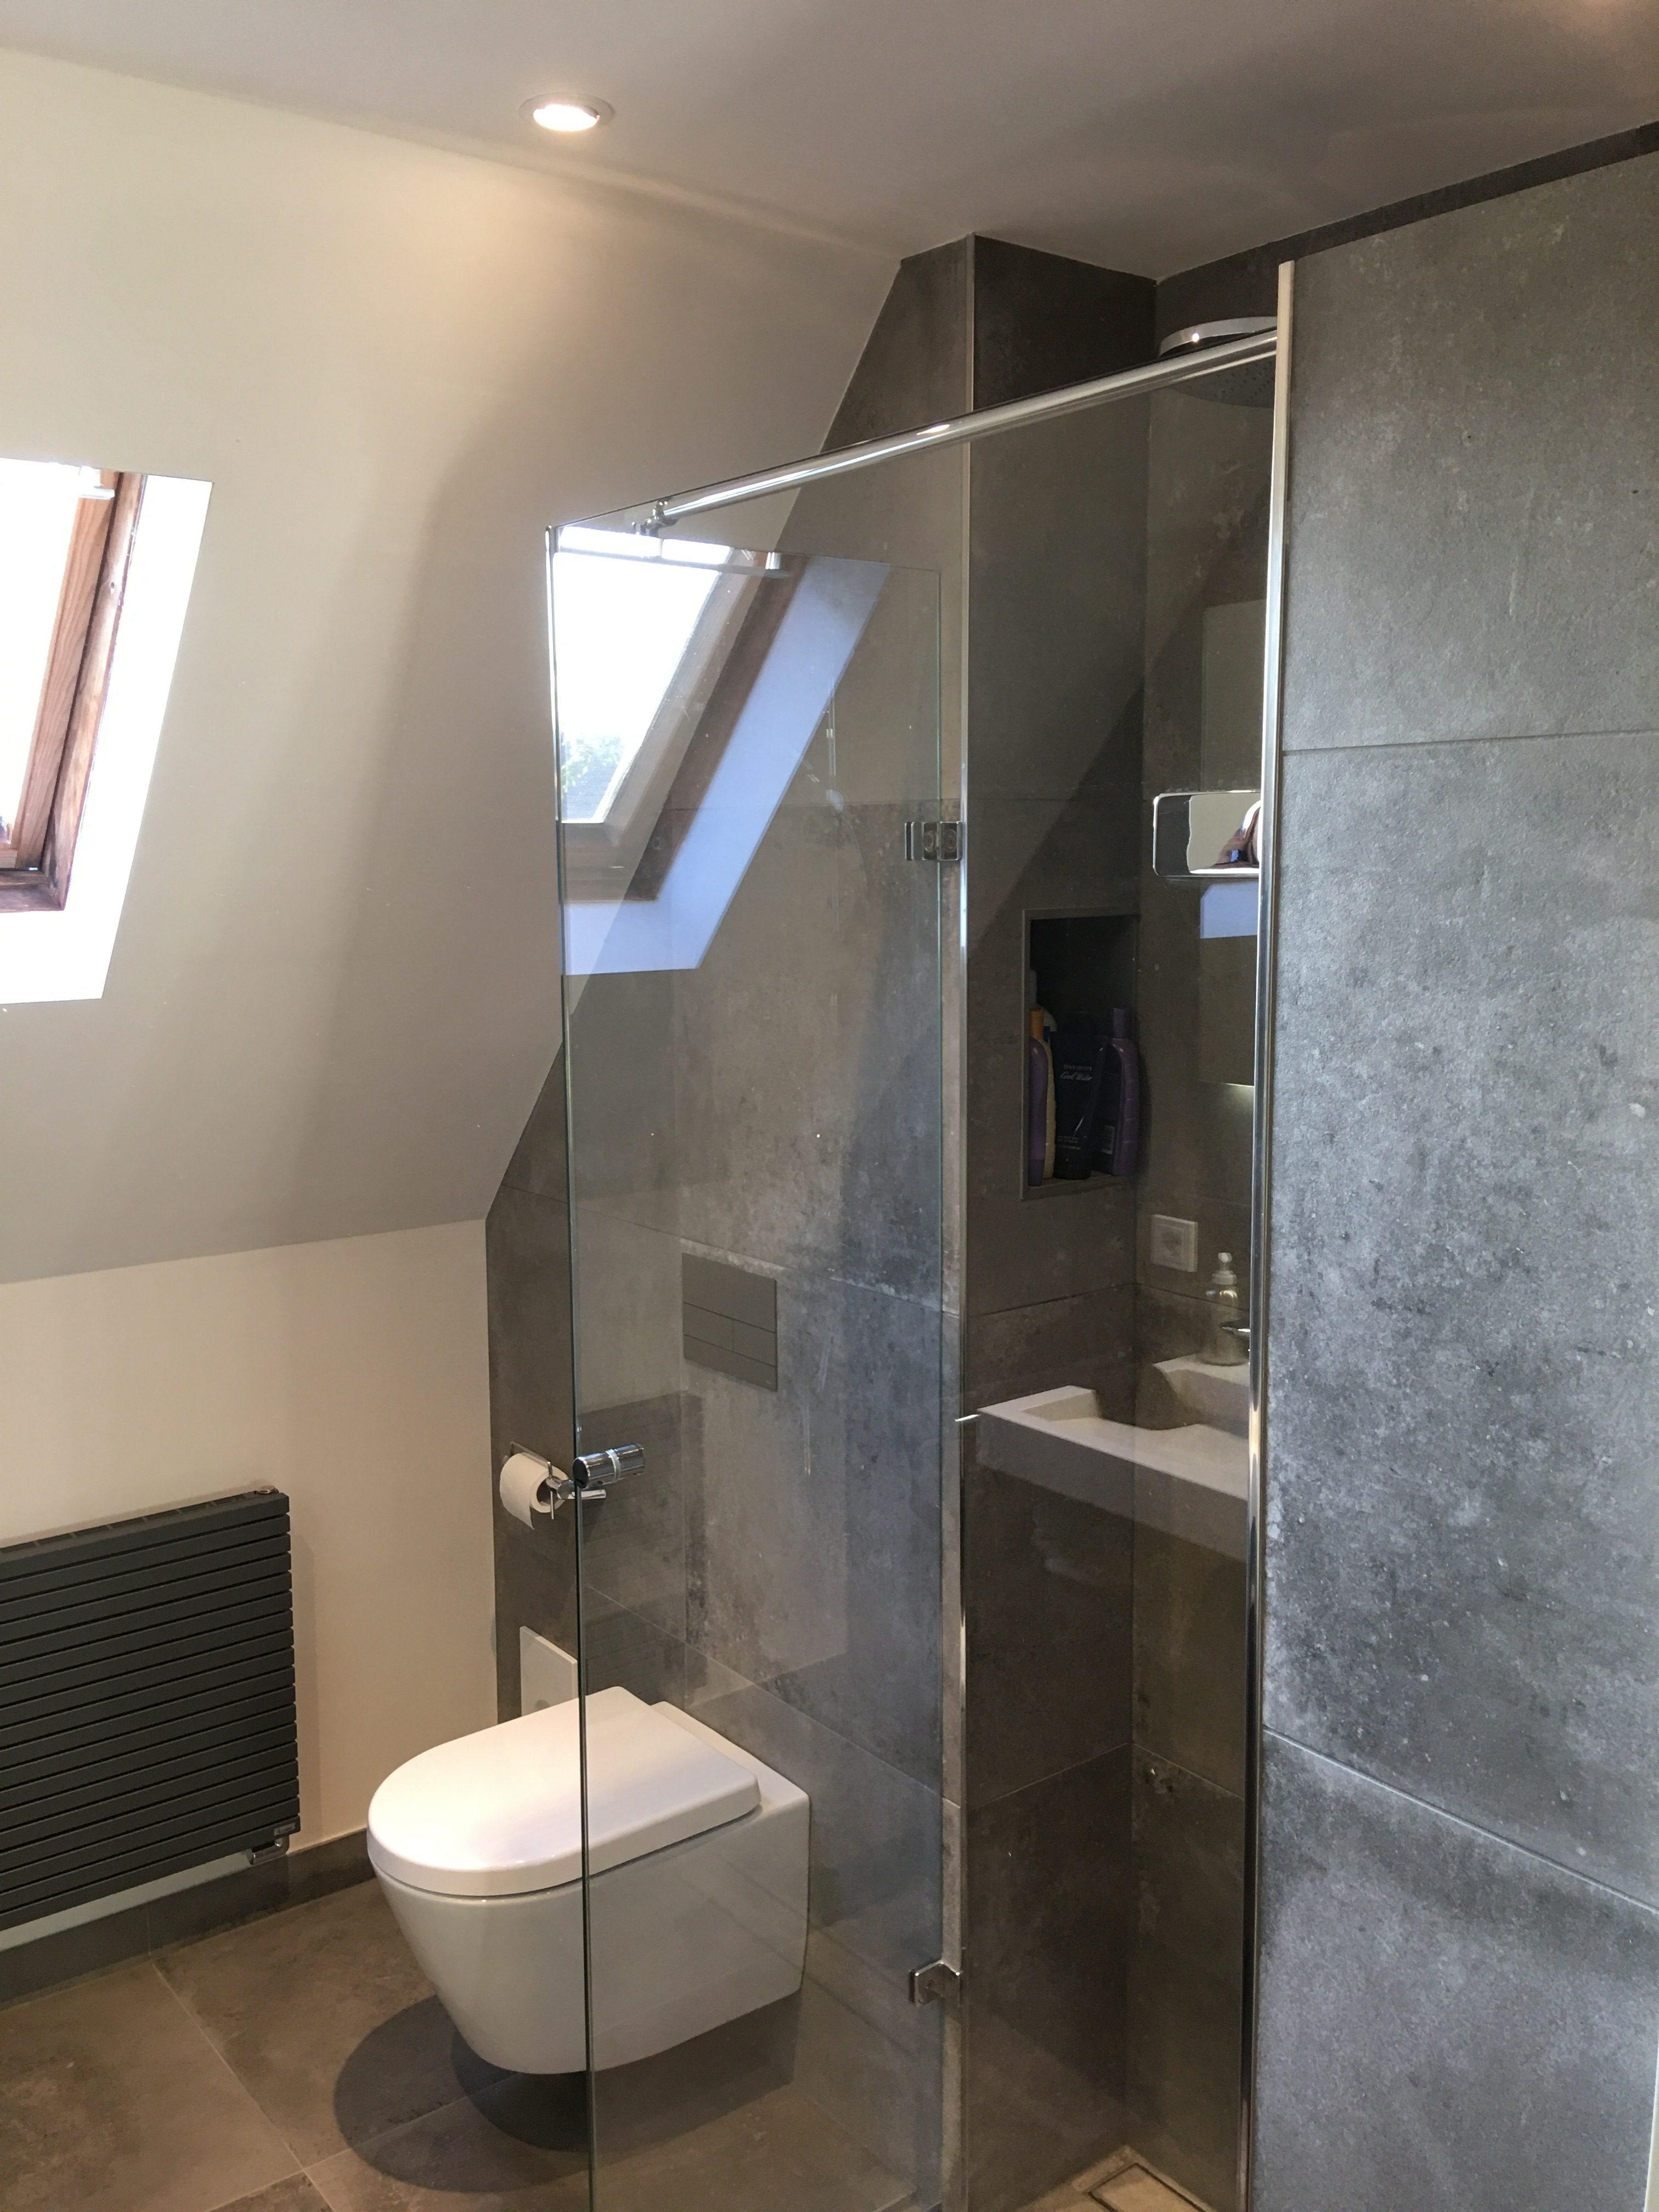 Badkamer Maurik beton look tegels - Wiesenekker Badkamerconcepten